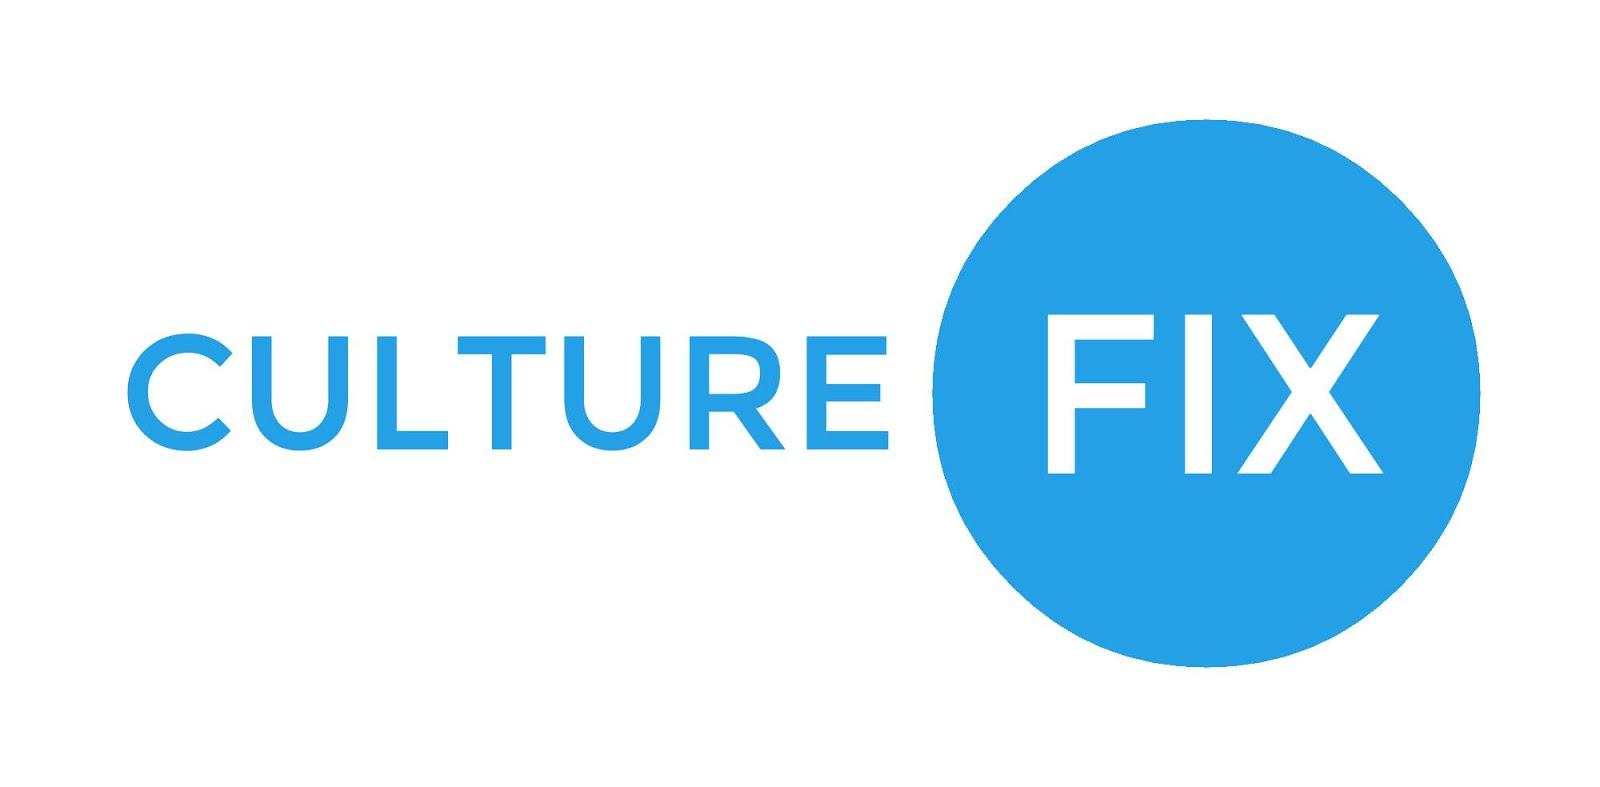 About Culture Fix